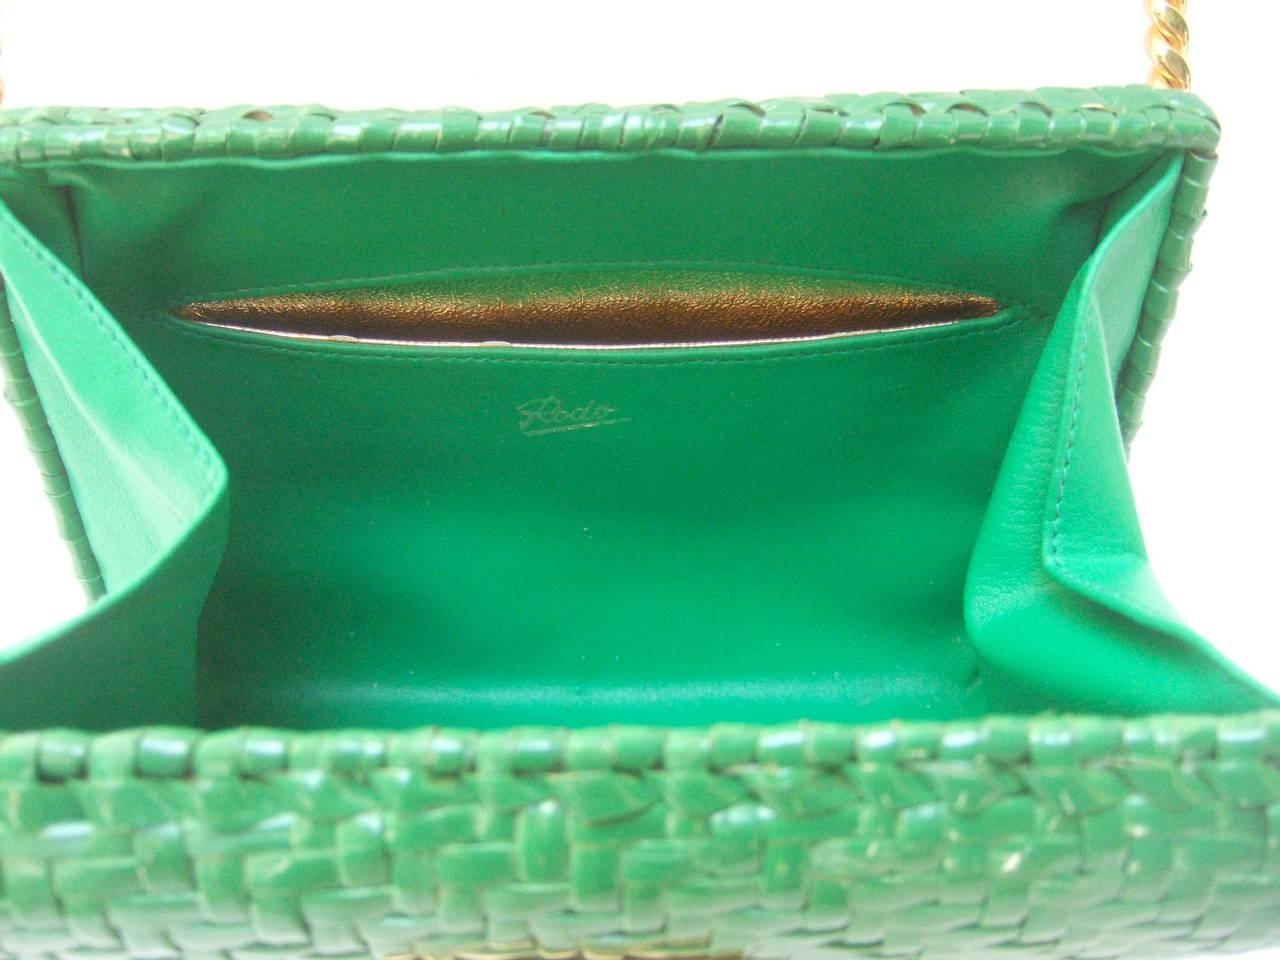 Rodo Italy Emerald Green Gilt Trim Wicker Clutch C 1980 At